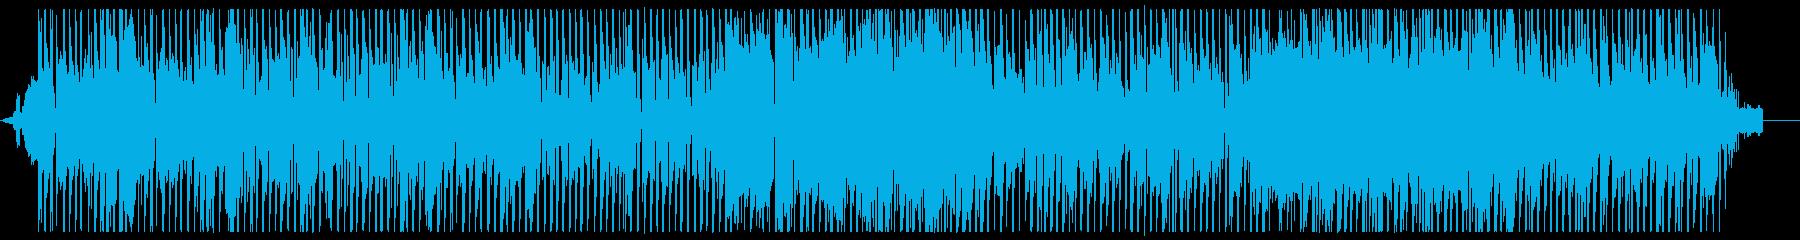 coma whiteの再生済みの波形